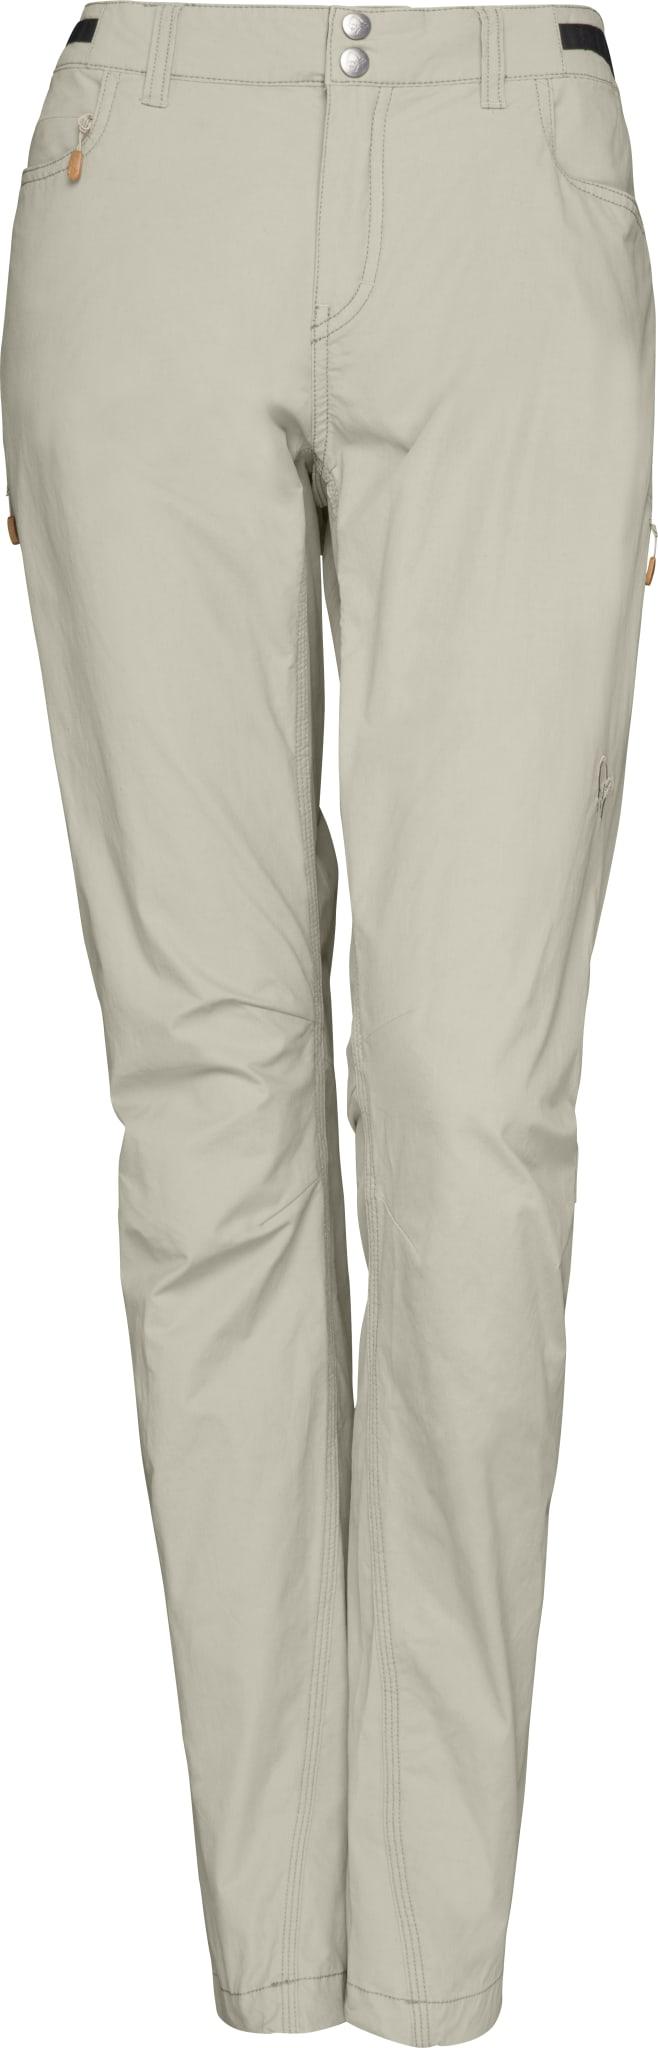 Svalbard Light Cotton Pants W